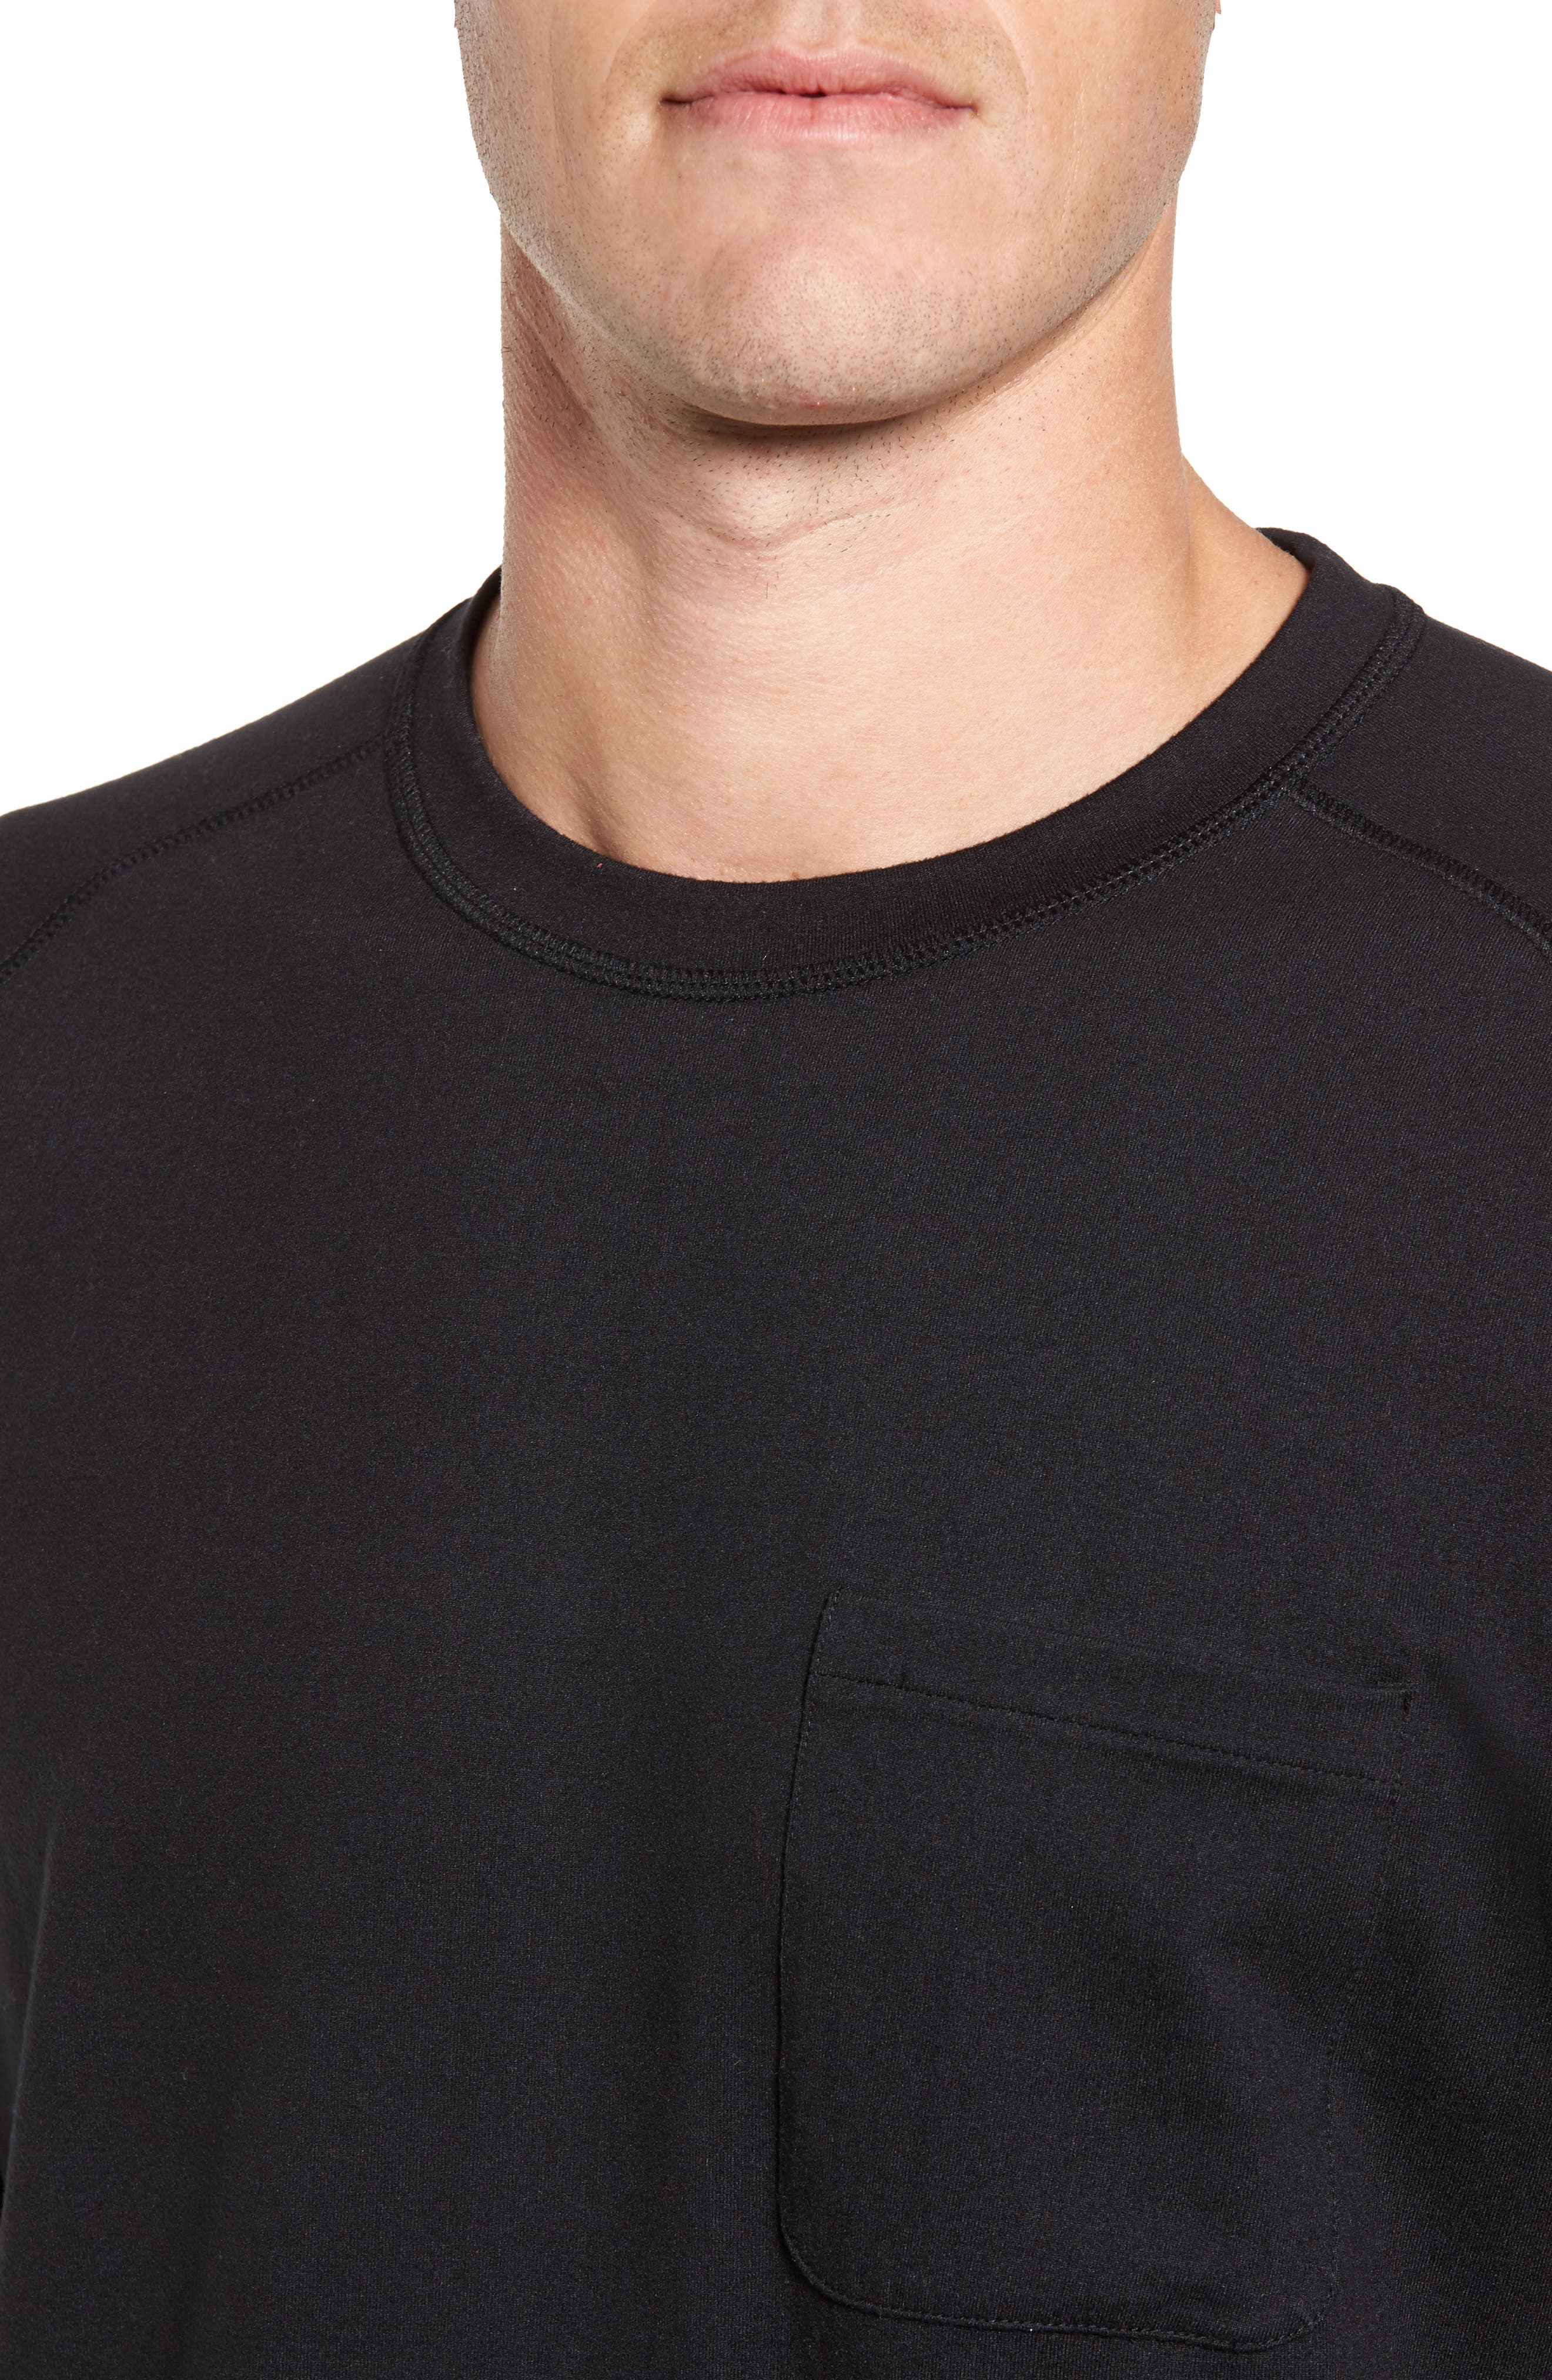 Longline Crewneck T-Shirt,                             Alternate thumbnail 4, color,                             001